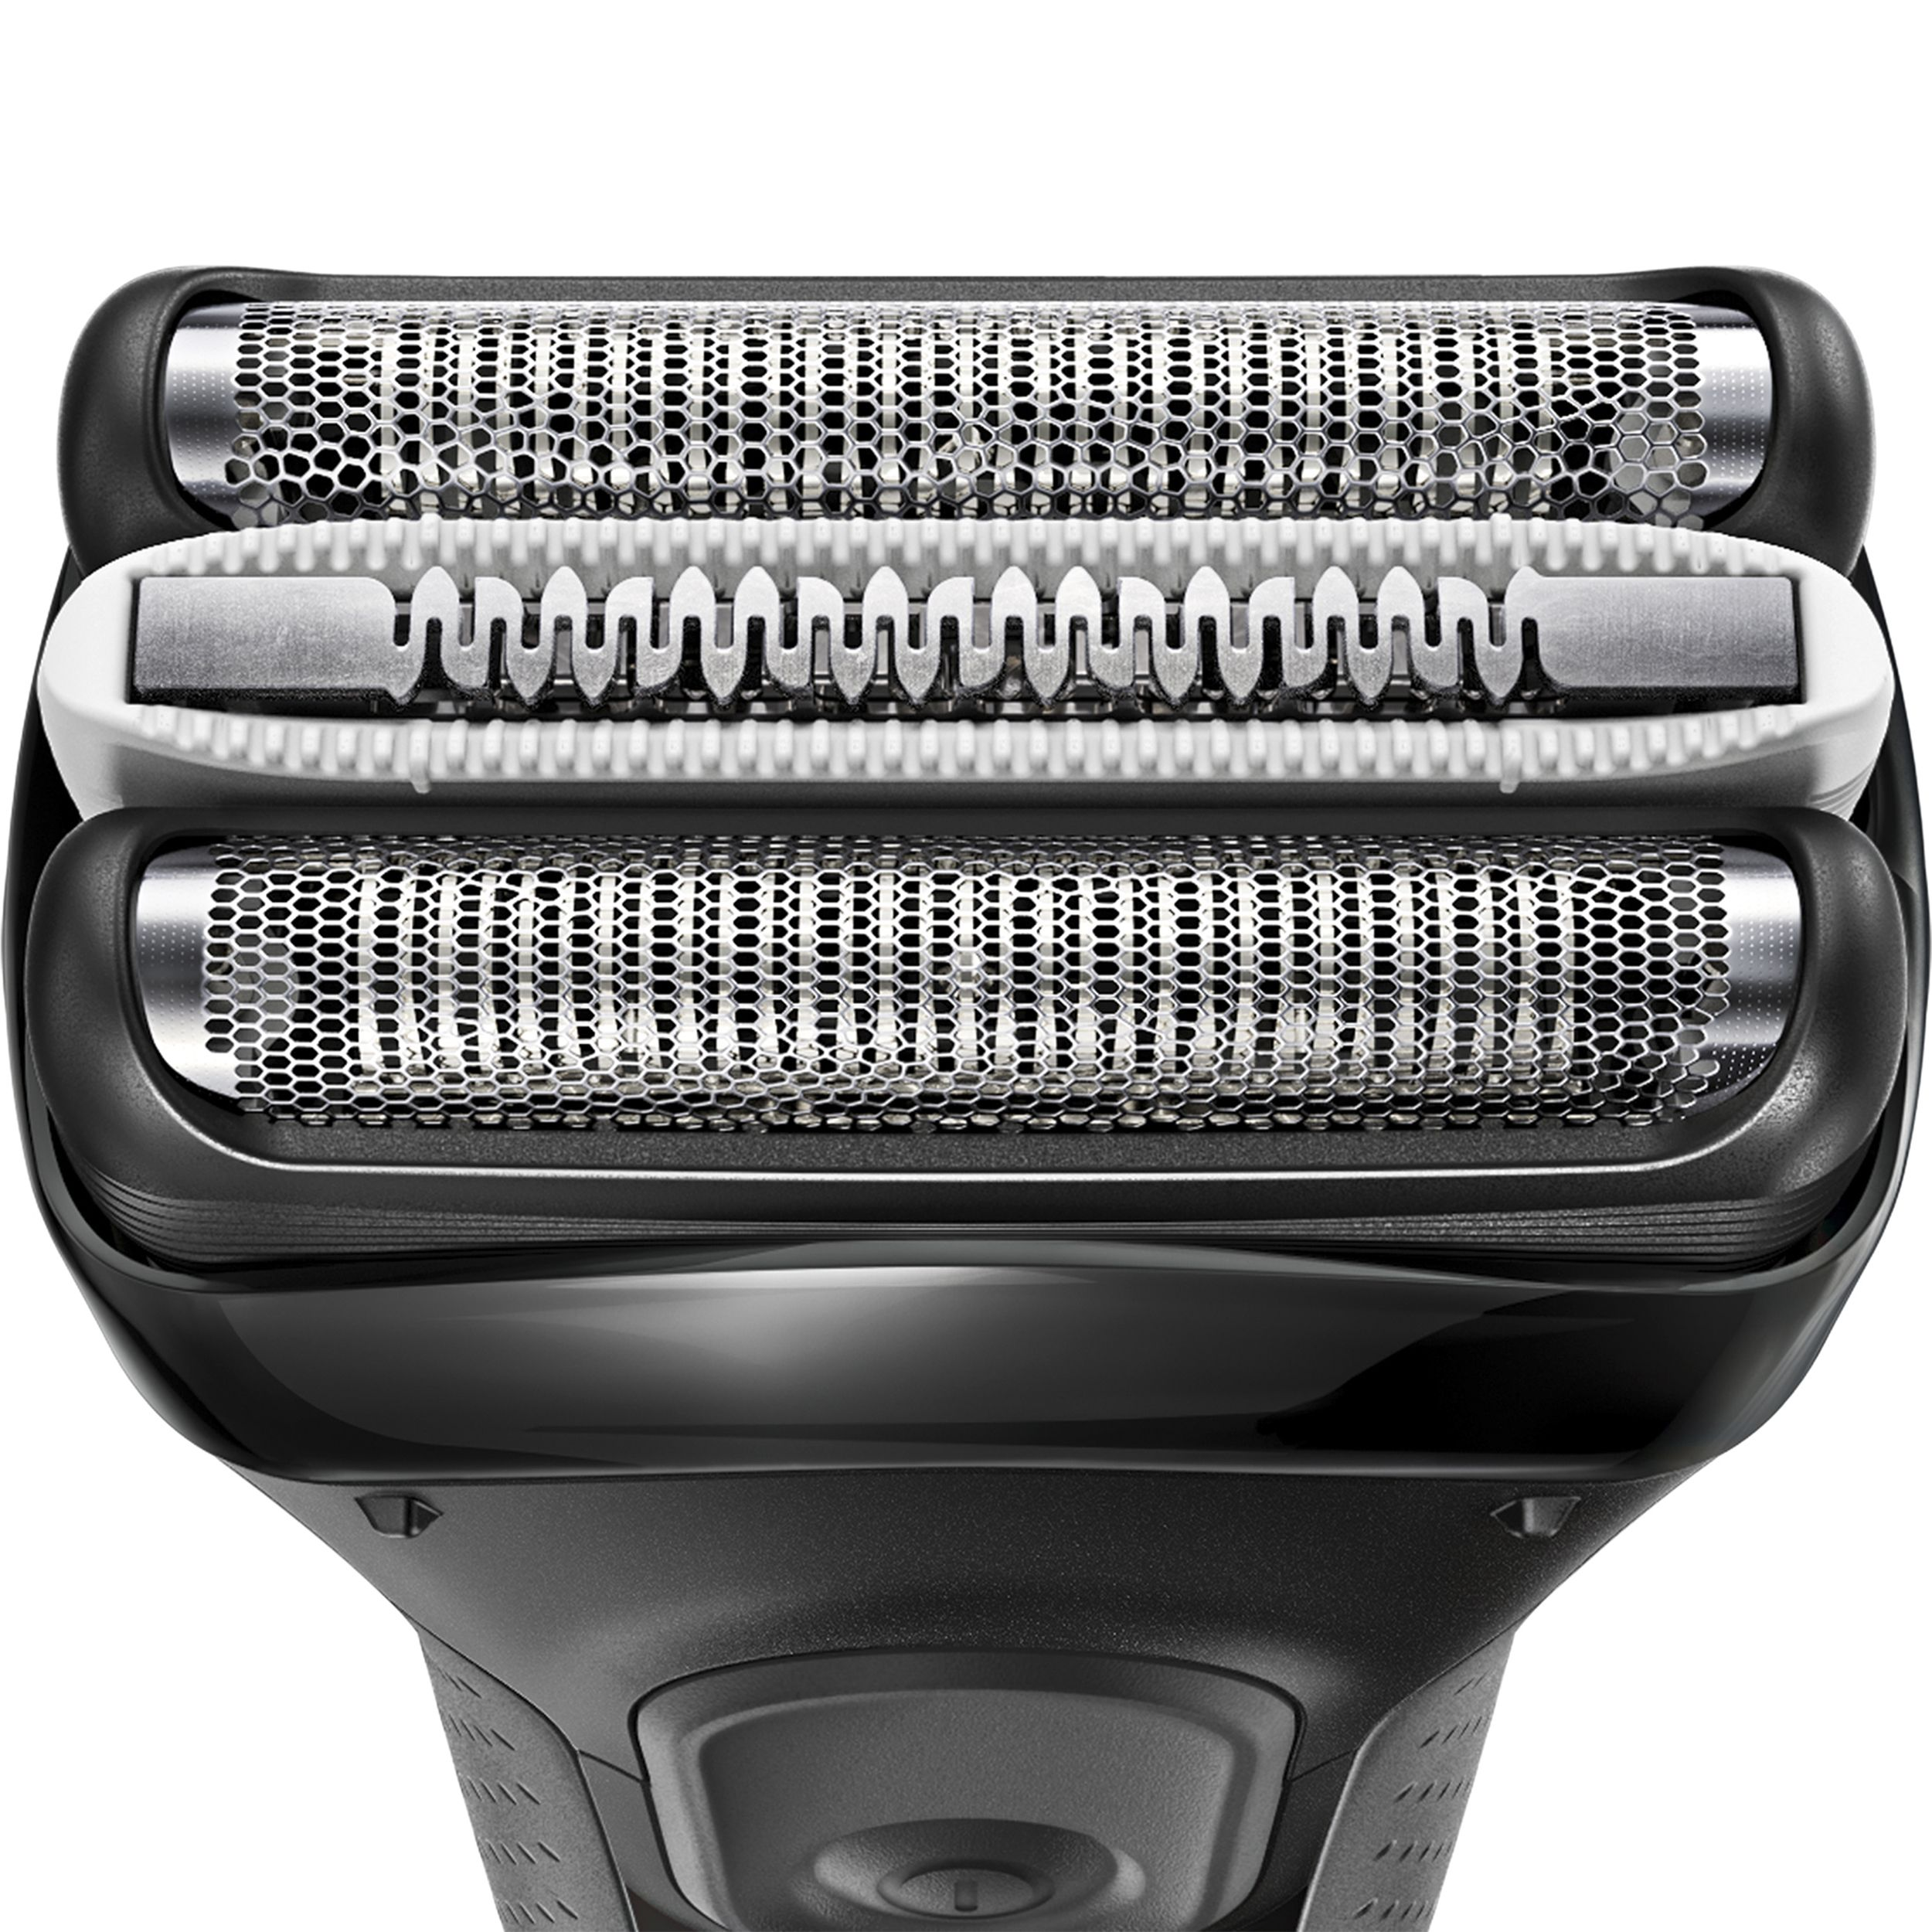 Braun Series 3 ProSkin 3050cc Electric Shaver for Men